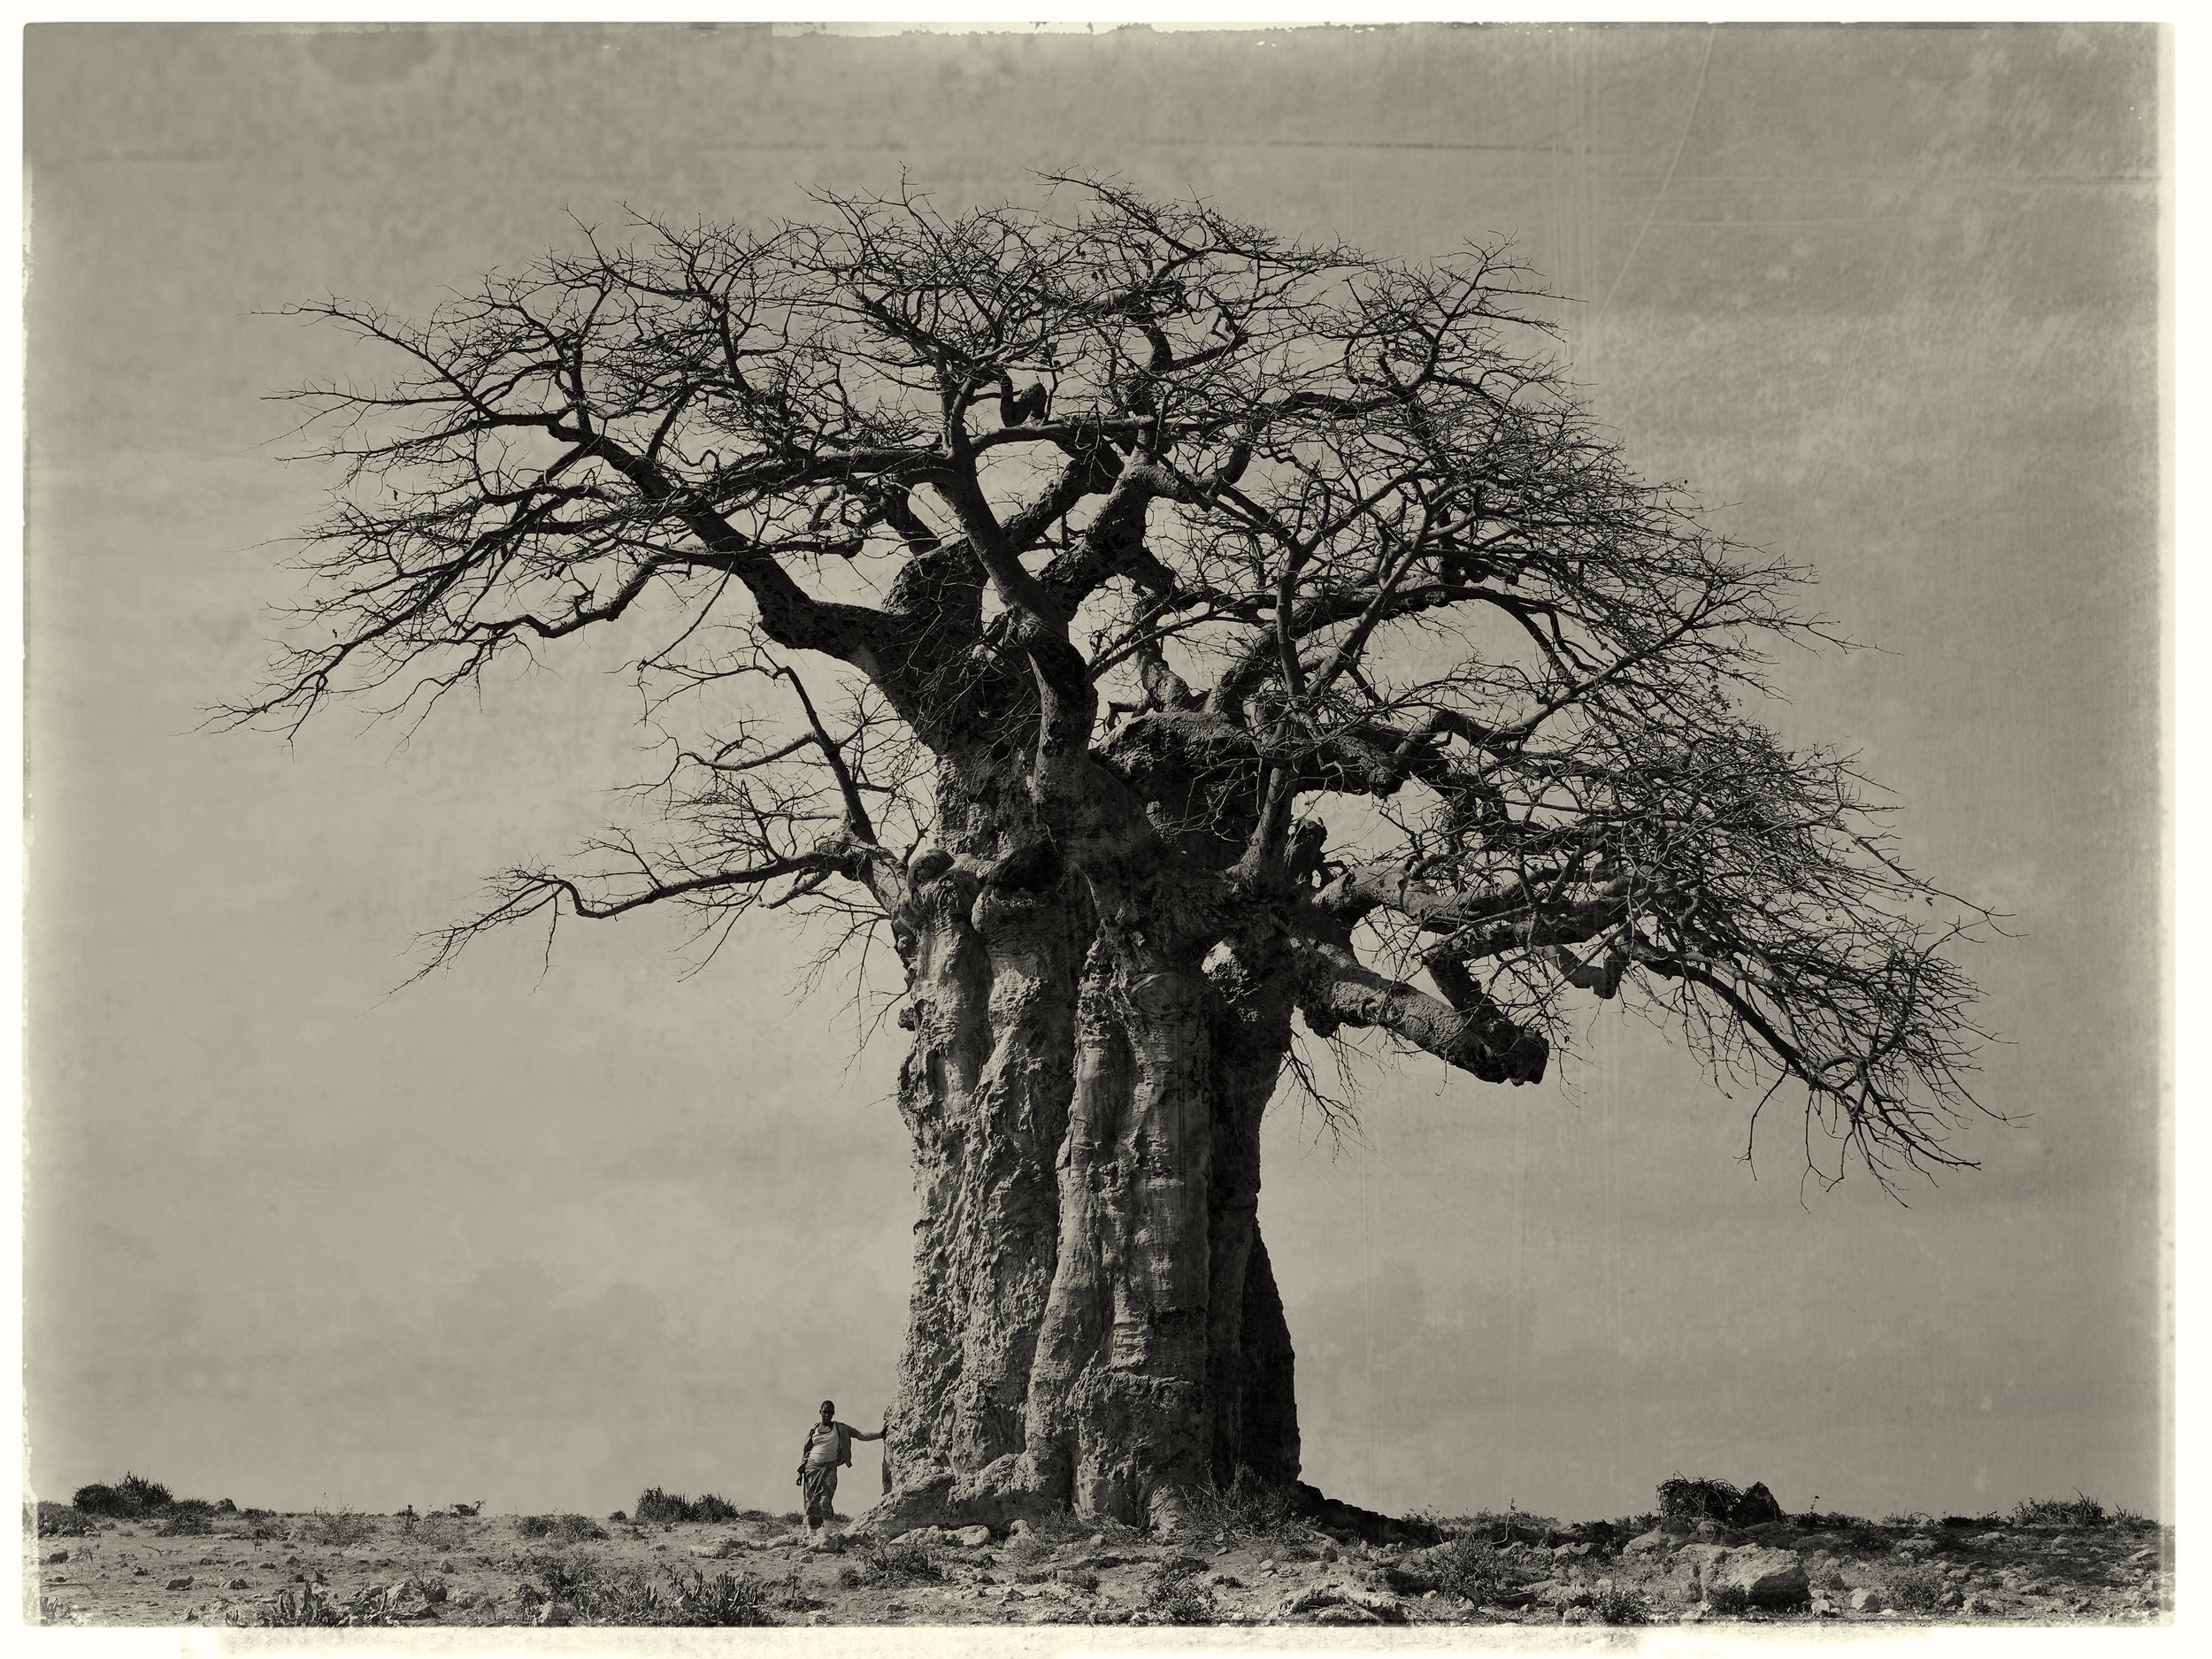 BaobabTree_BW_Test.jpg